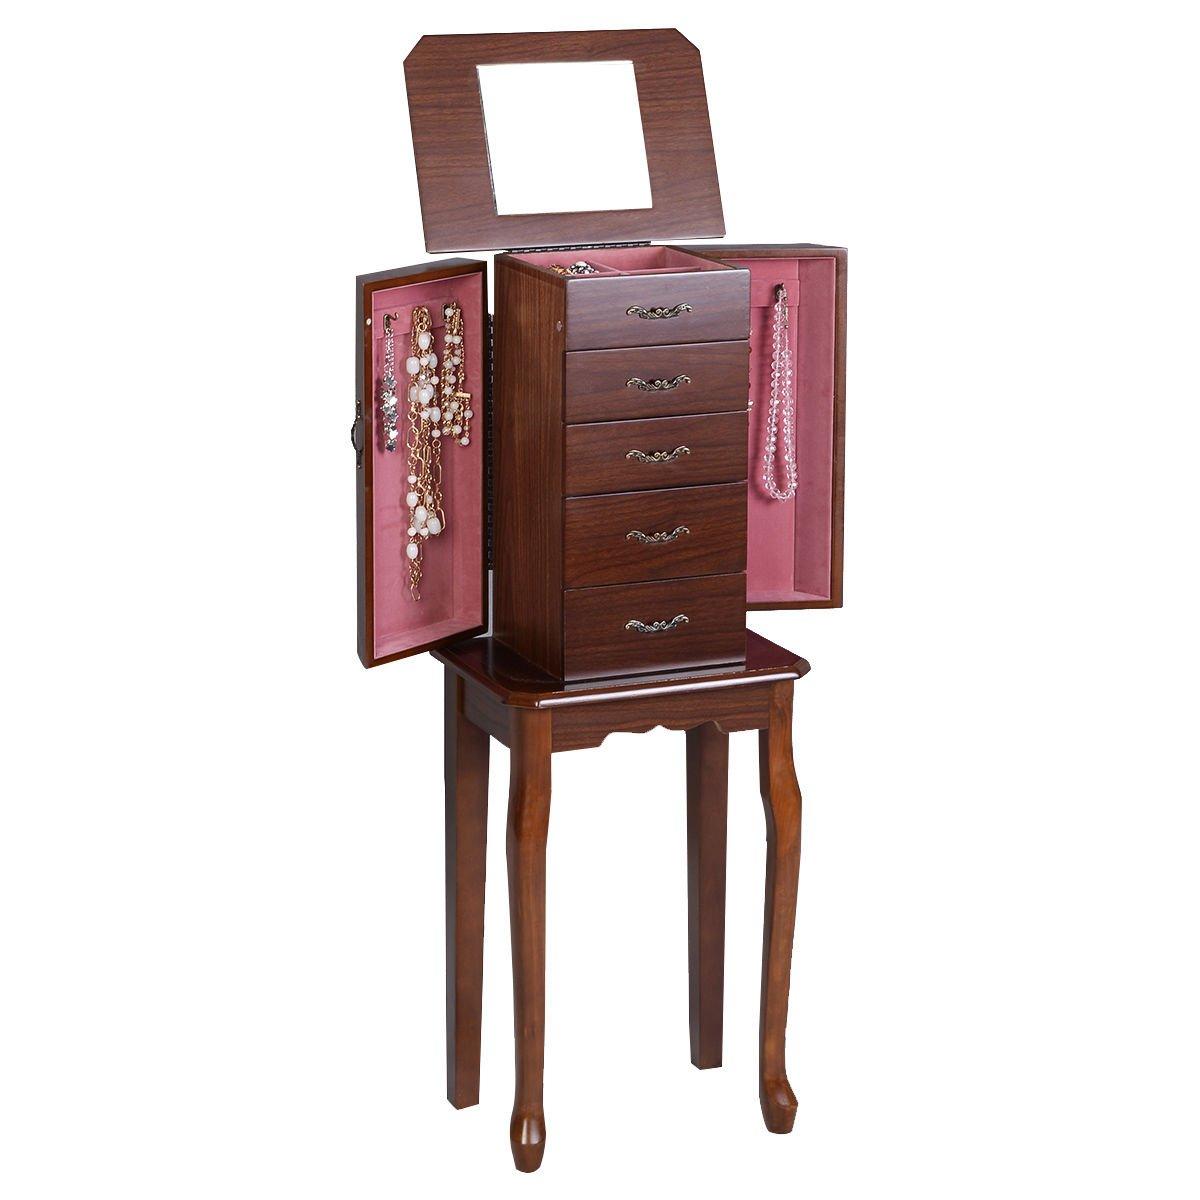 Wood Chest Organizer Accessory Stand Classic Mirror Armoire Jewelry Cabinet Storage Box